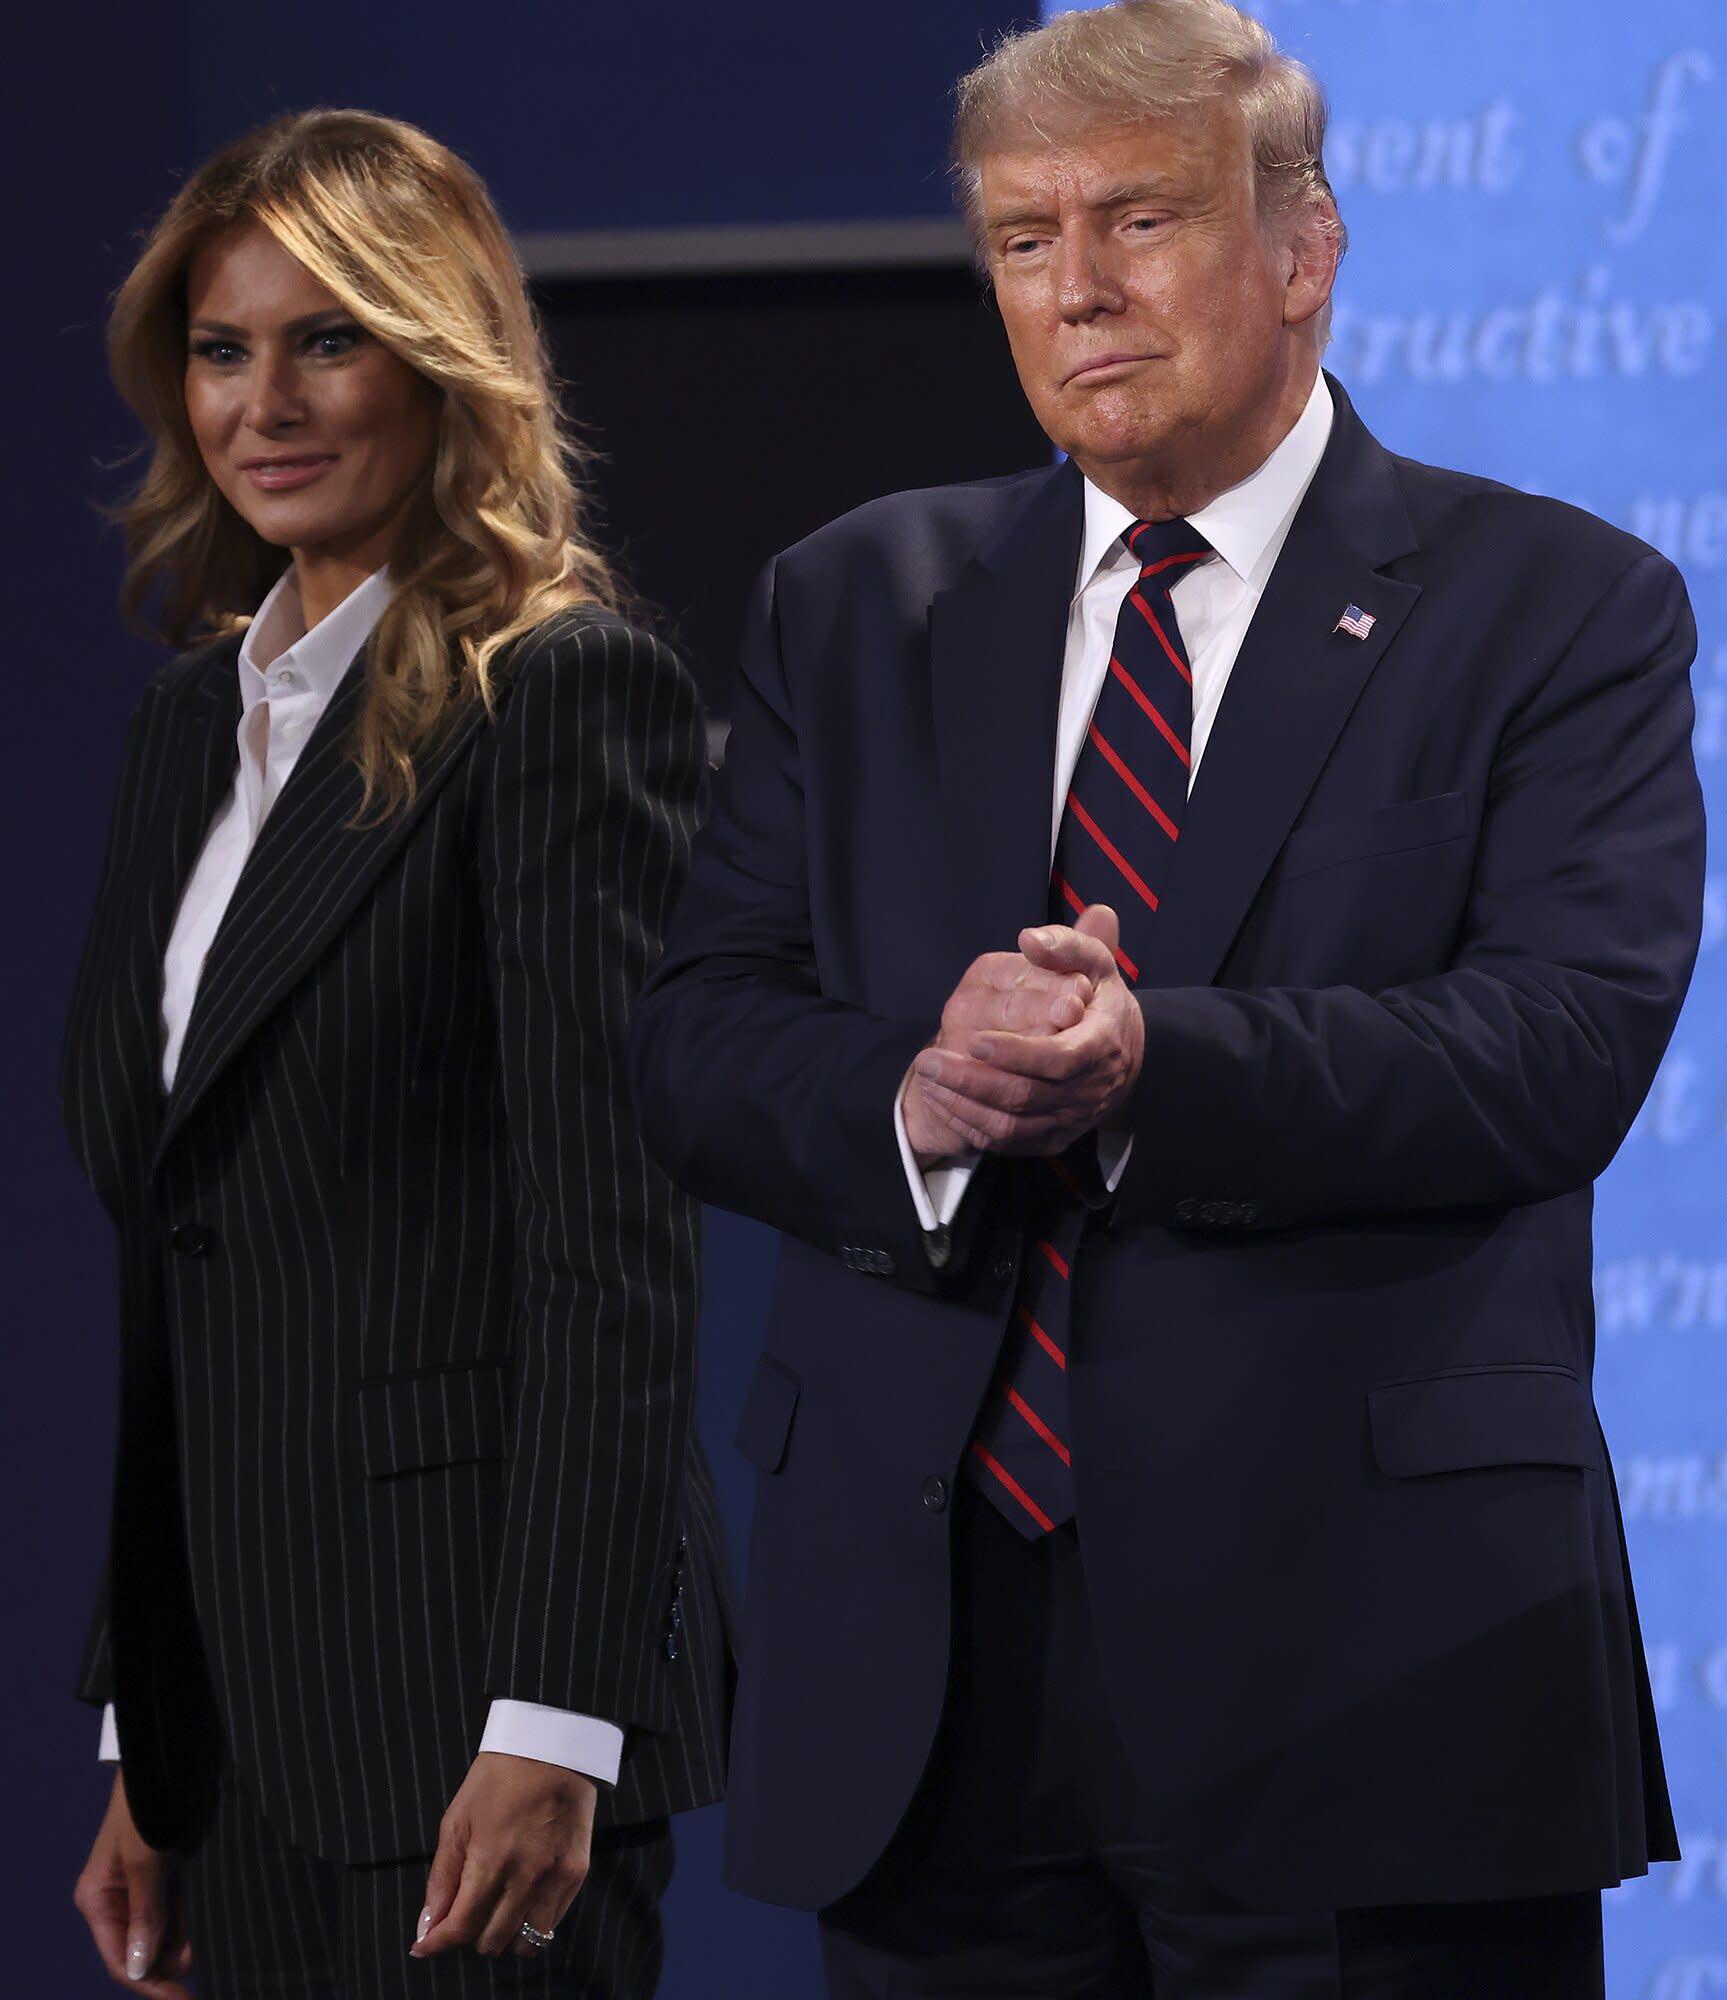 Donald Trump Sits Through Sermon on Humility, Embracing